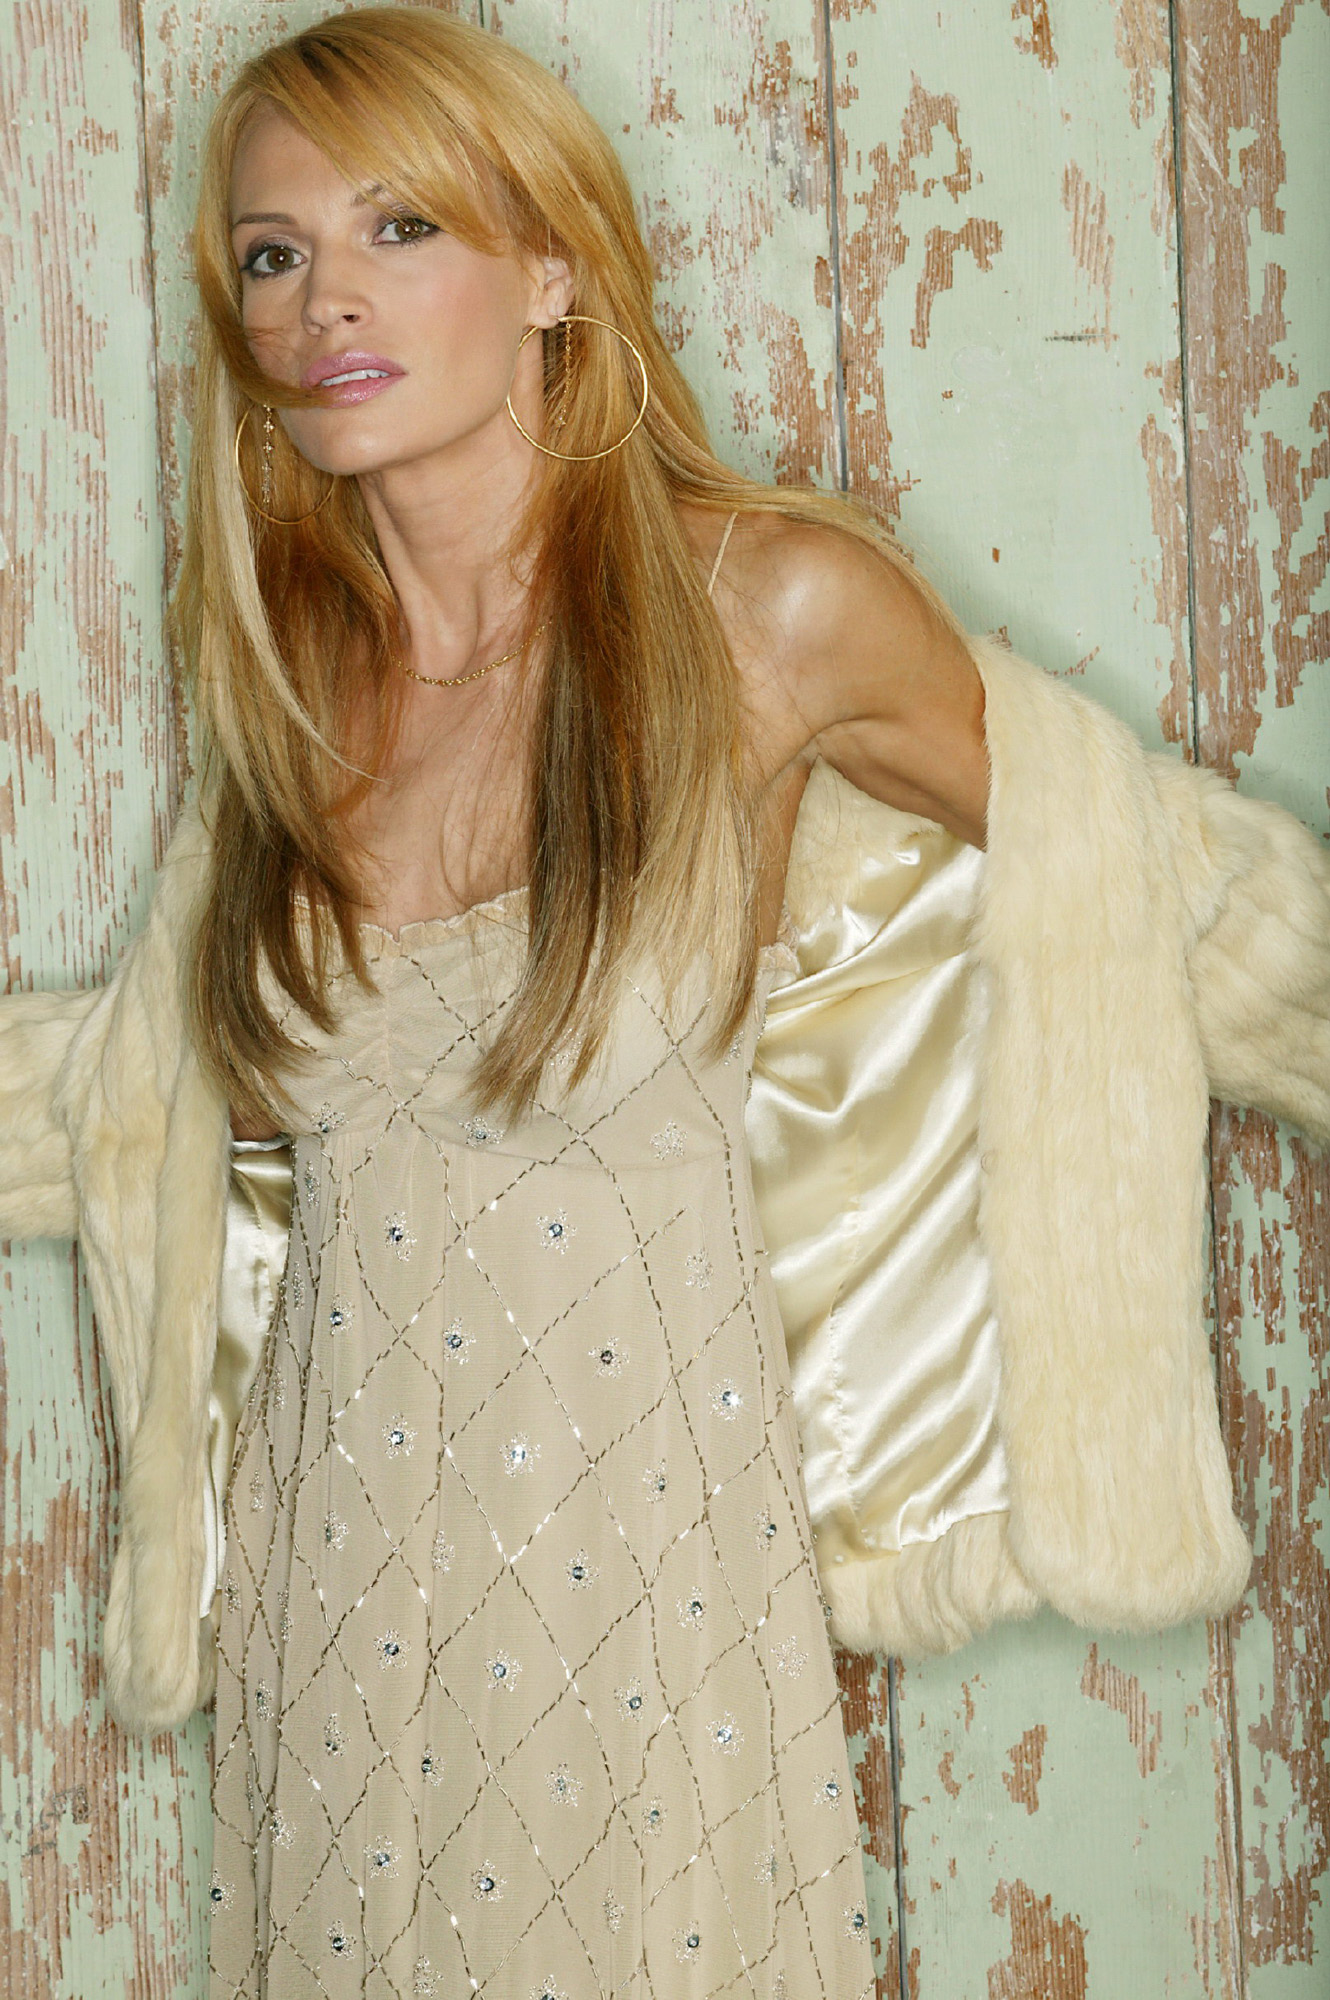 Poze rezolutie mare Jolene Blalock - Actor - Poza 96 din